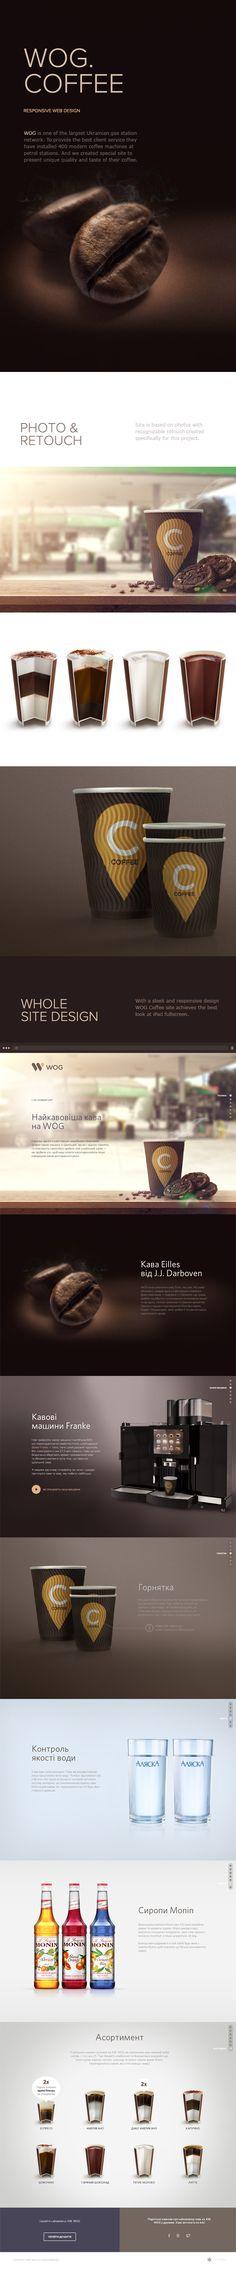 WOG Coffee site by Aimbulance Agency, via Behance